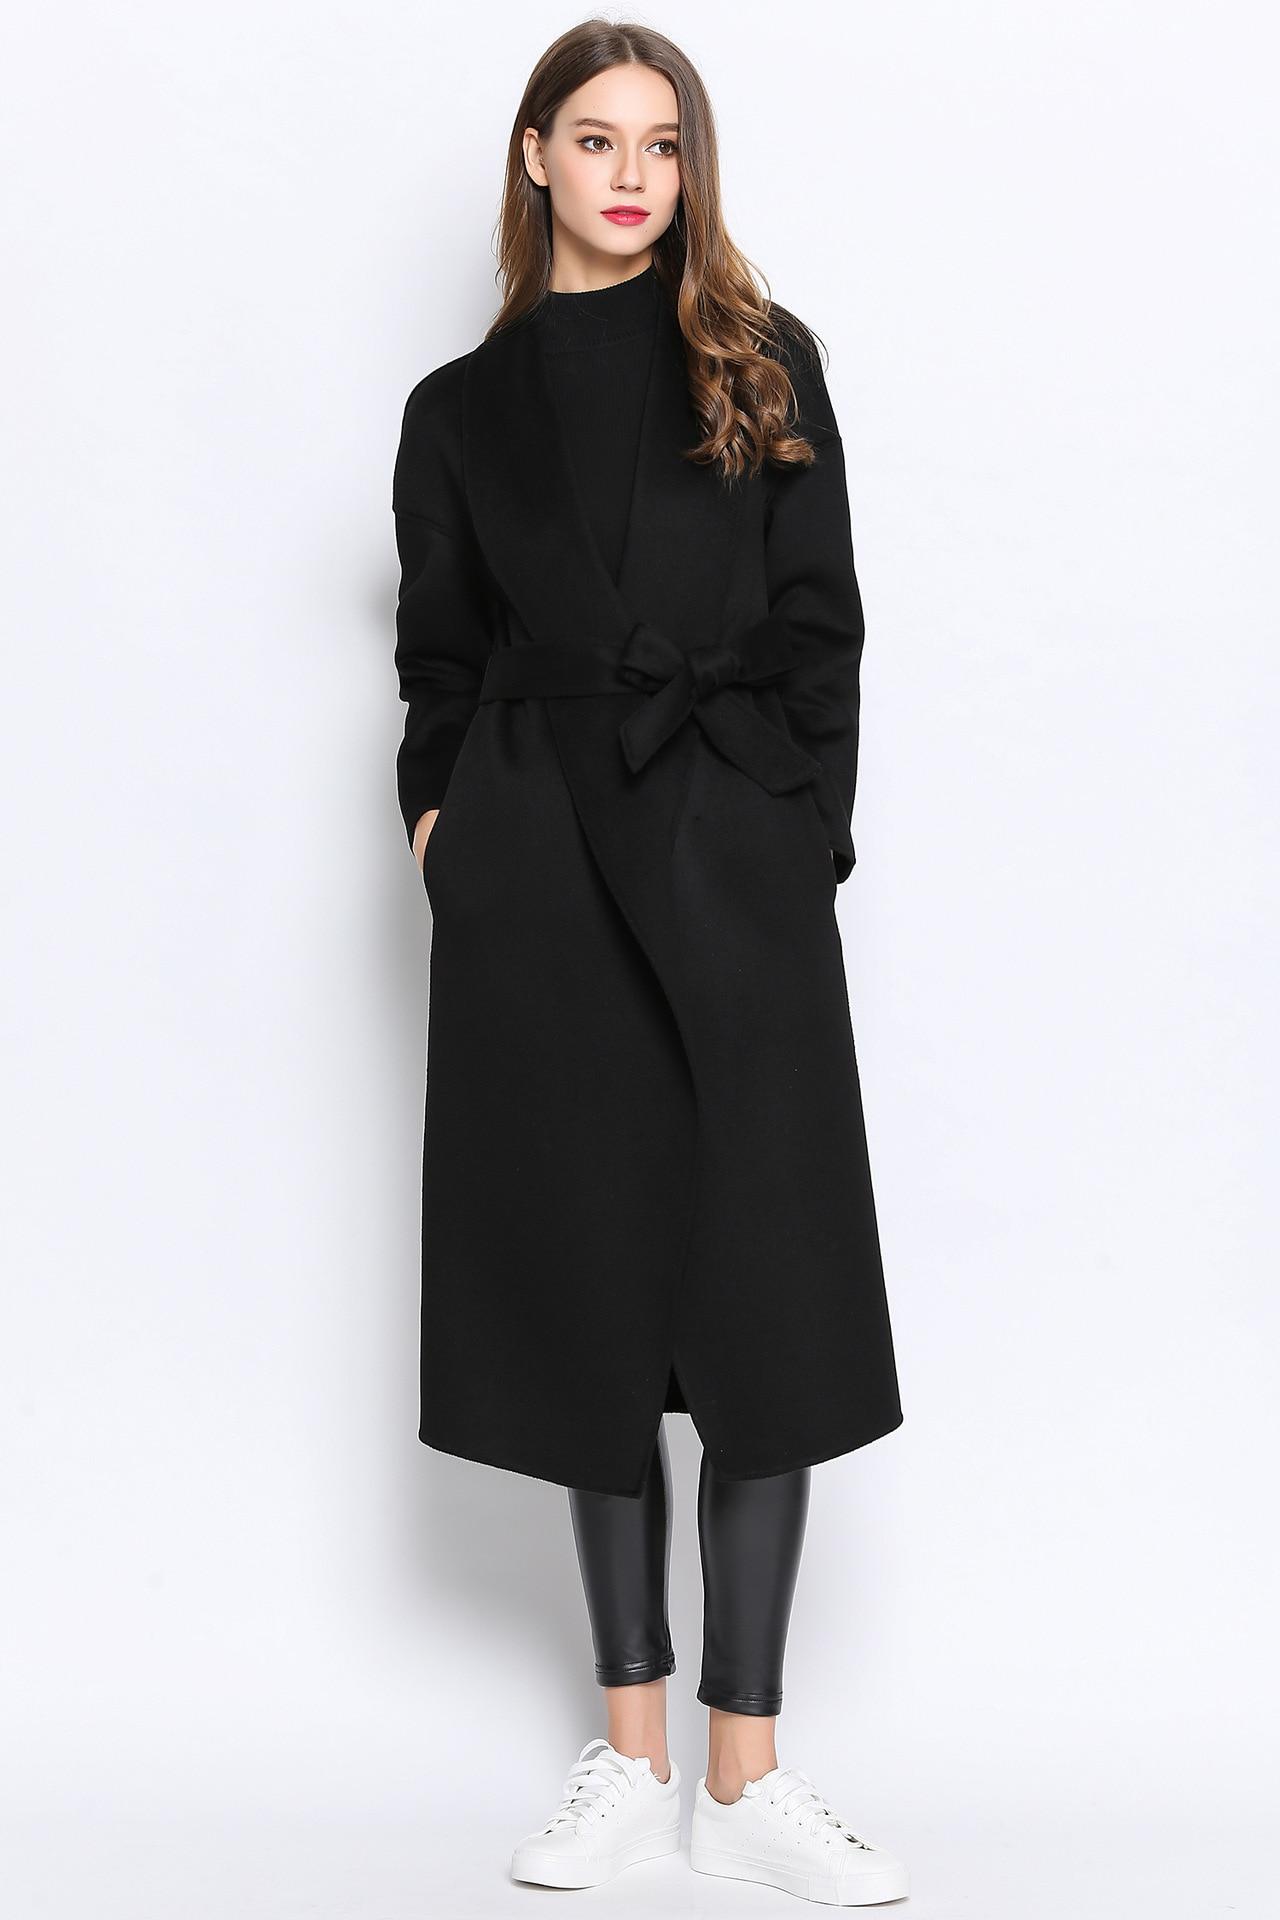 black winter belt 100 cashmere wool blend maxl font b jacket b font woolen long coat